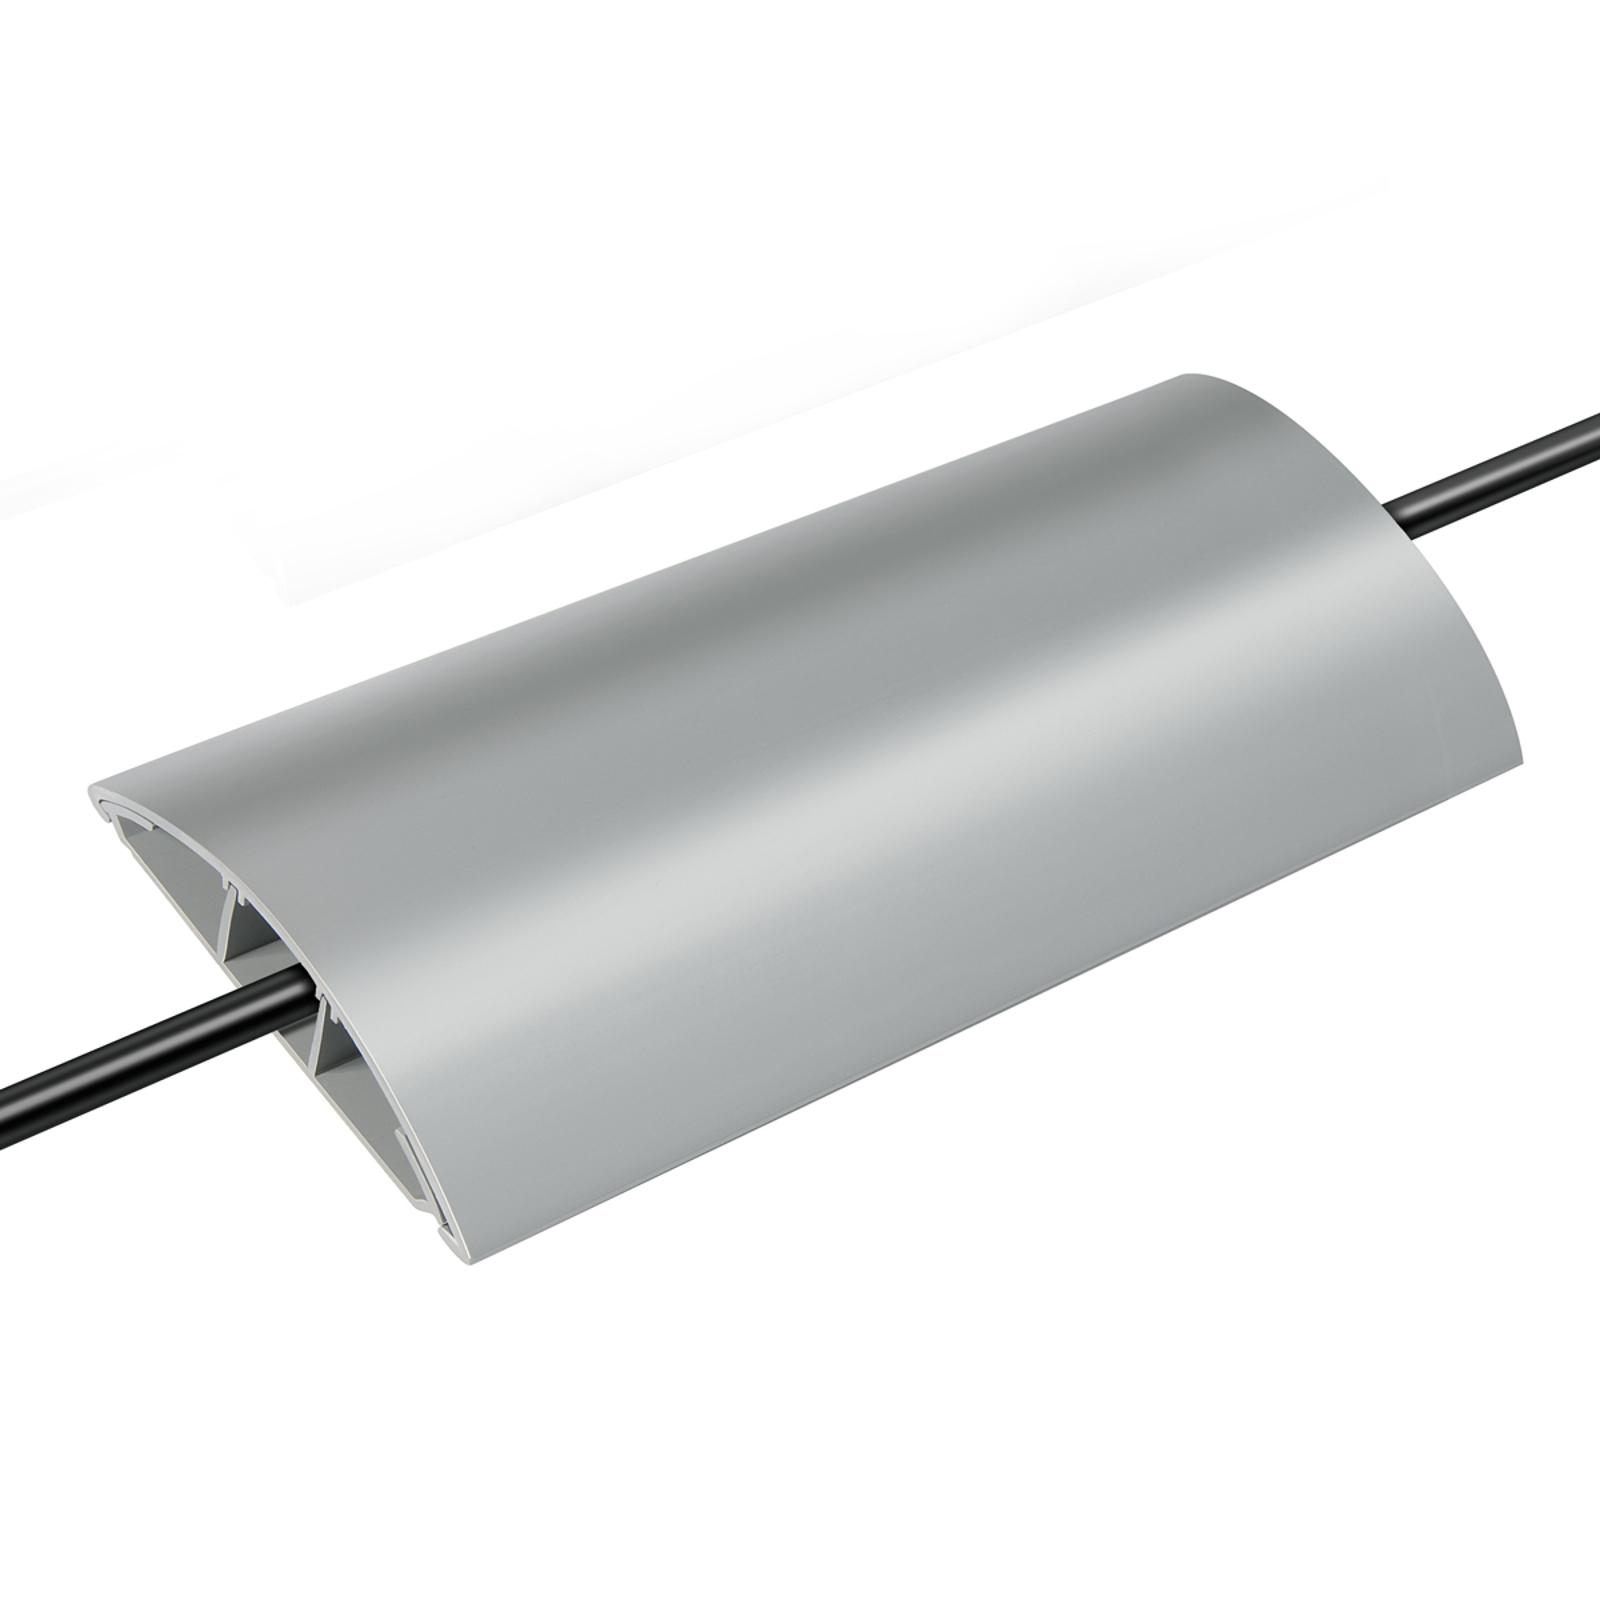 Robusto canale per cavi in PVC, calpestabile